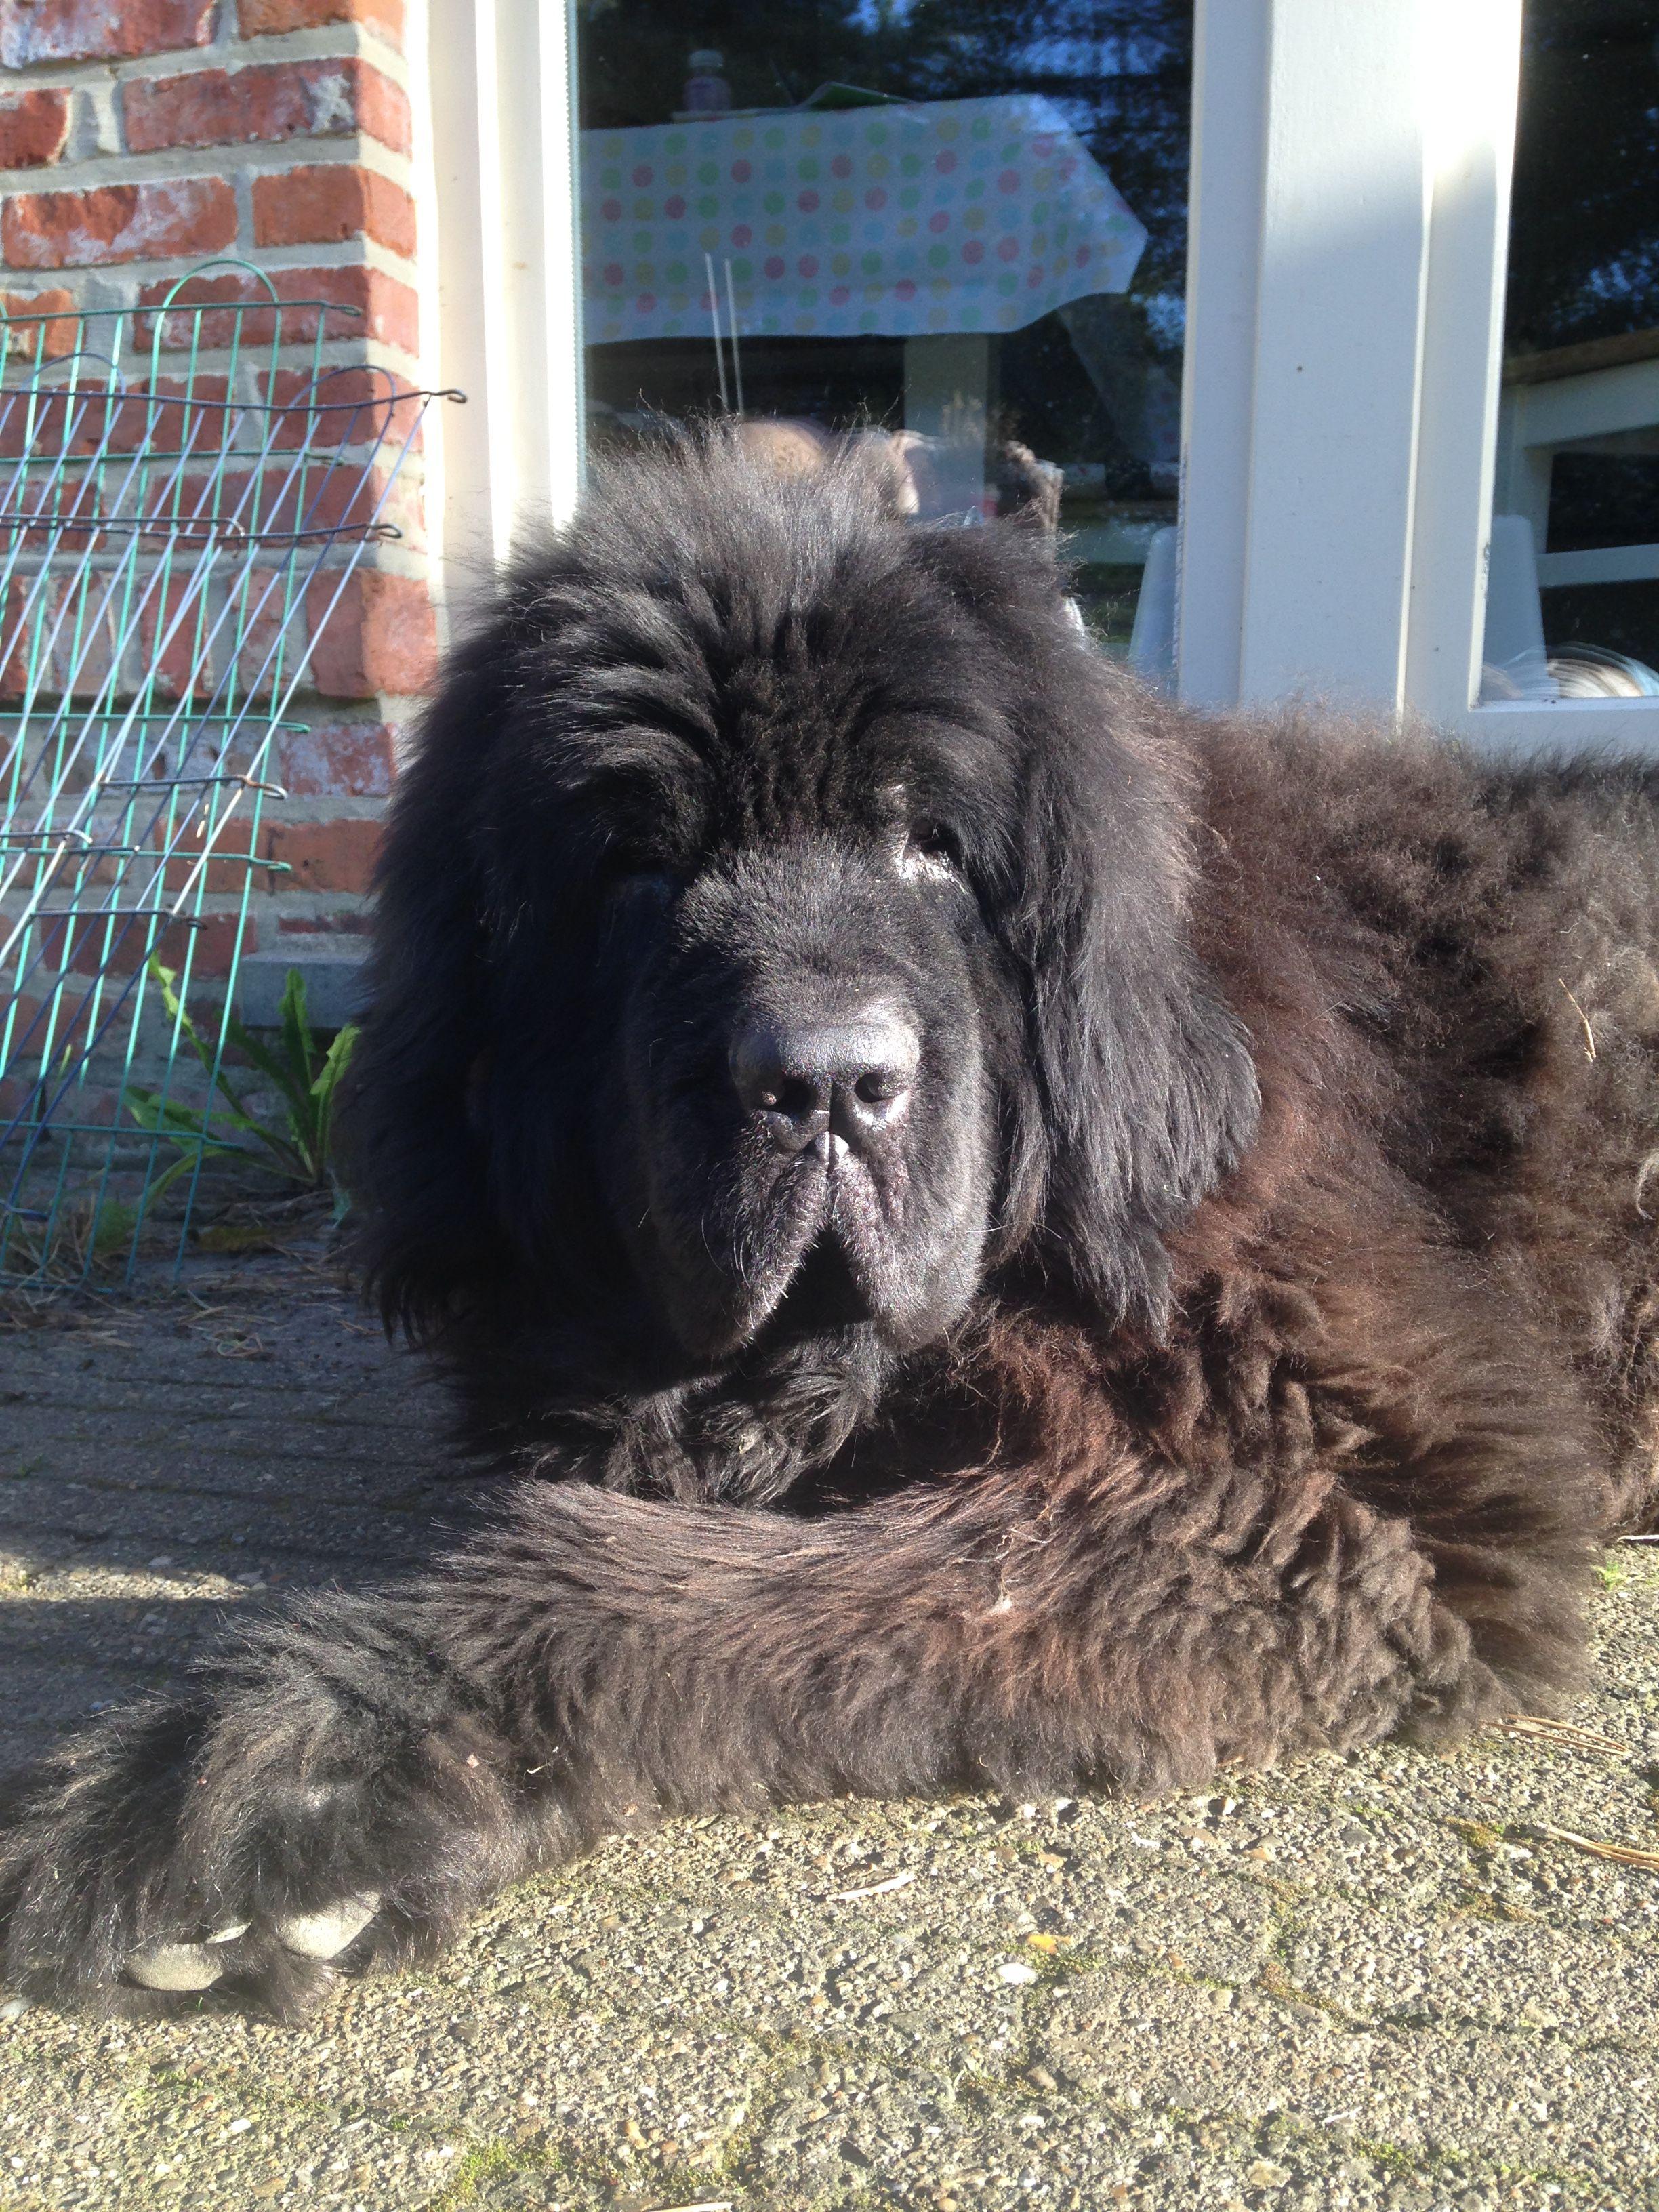 Mona newfoundland dog best dog in the world i miss you my friend